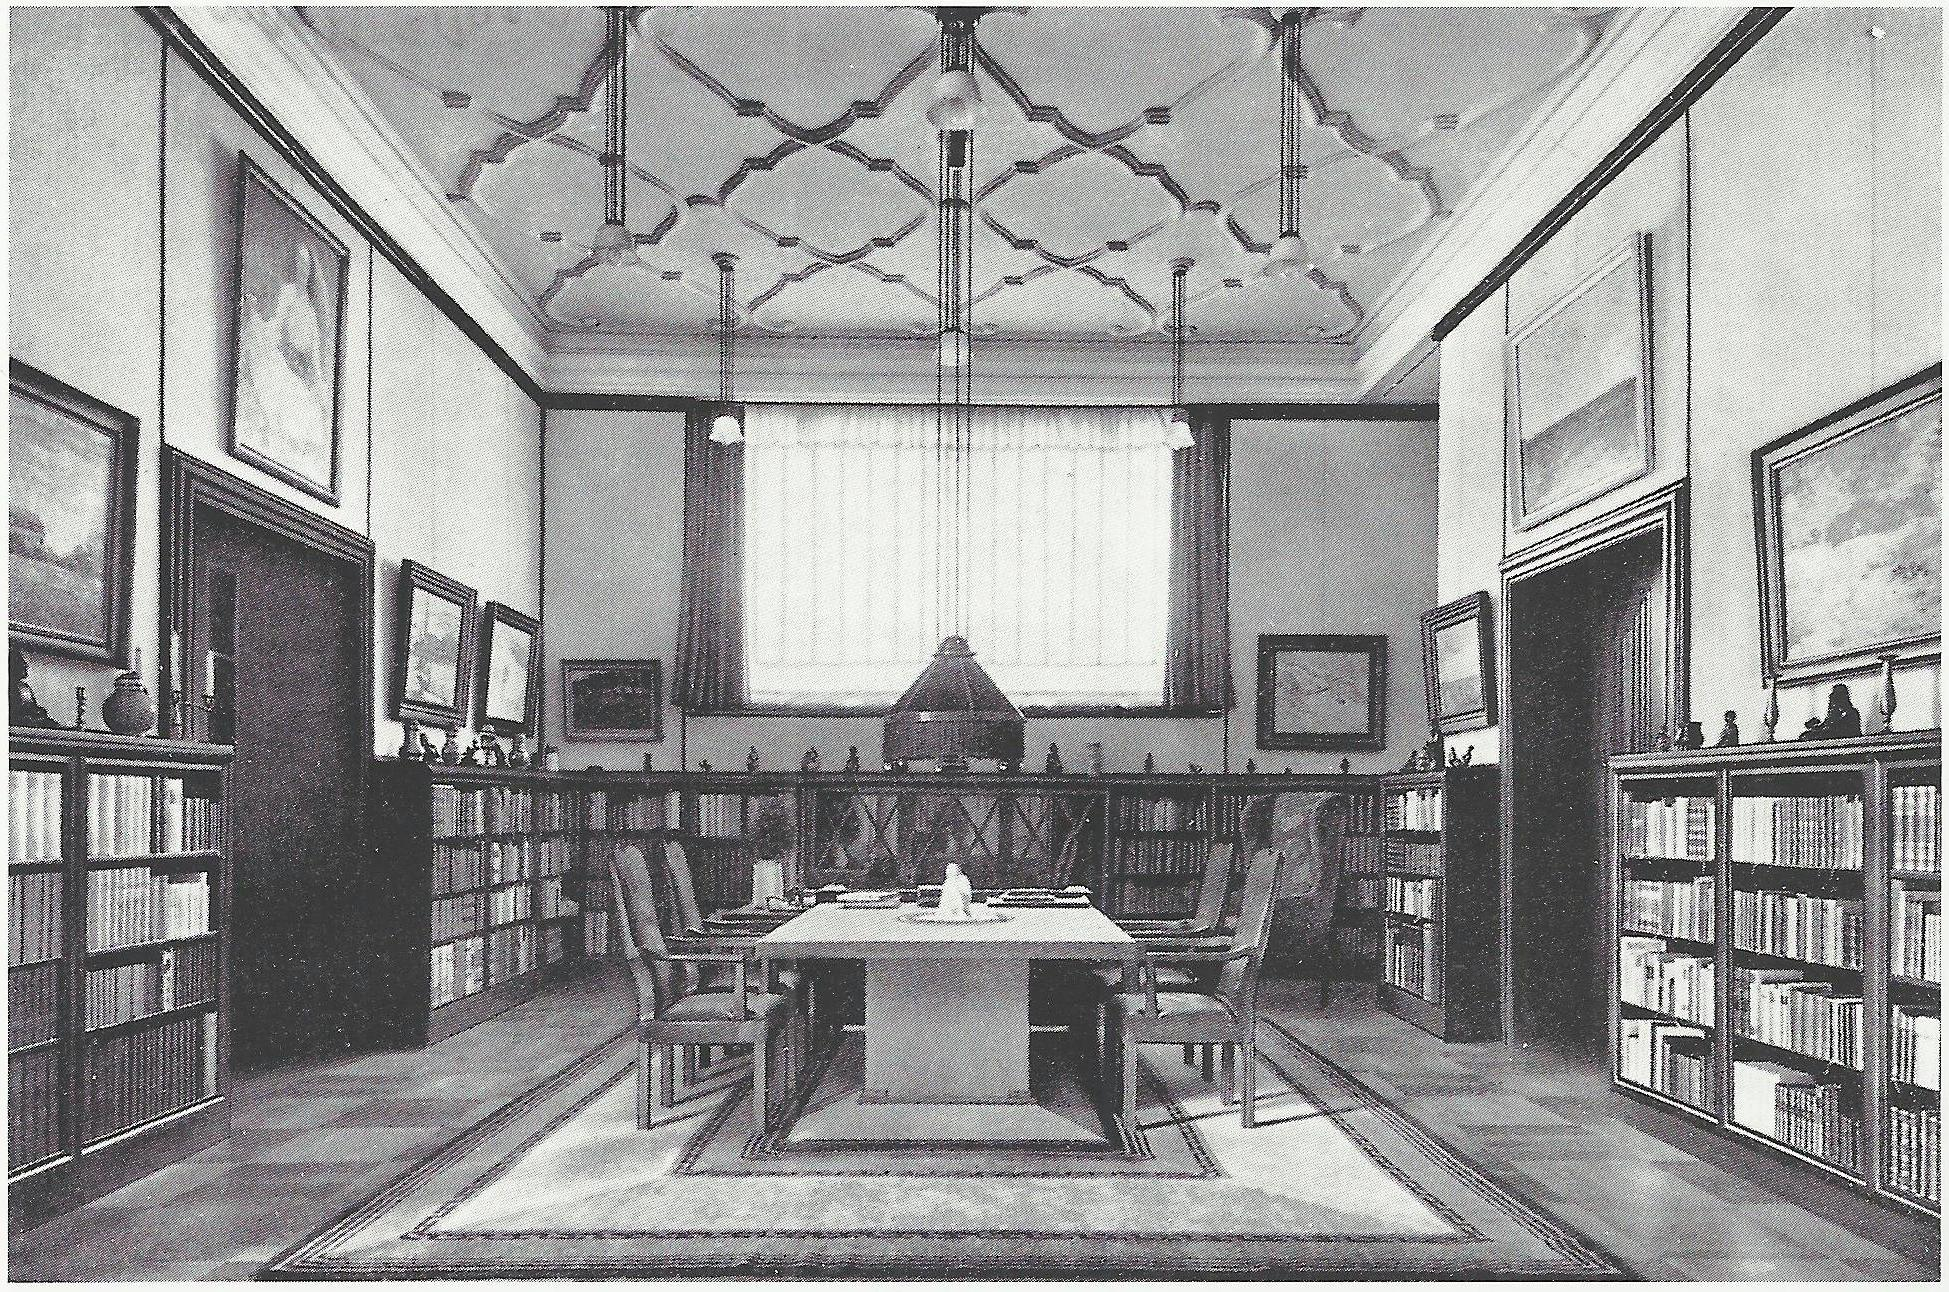 File:Köln-Marienburg Haus Feinhals Bibliothek 1911.jpg - Wikimedia ...